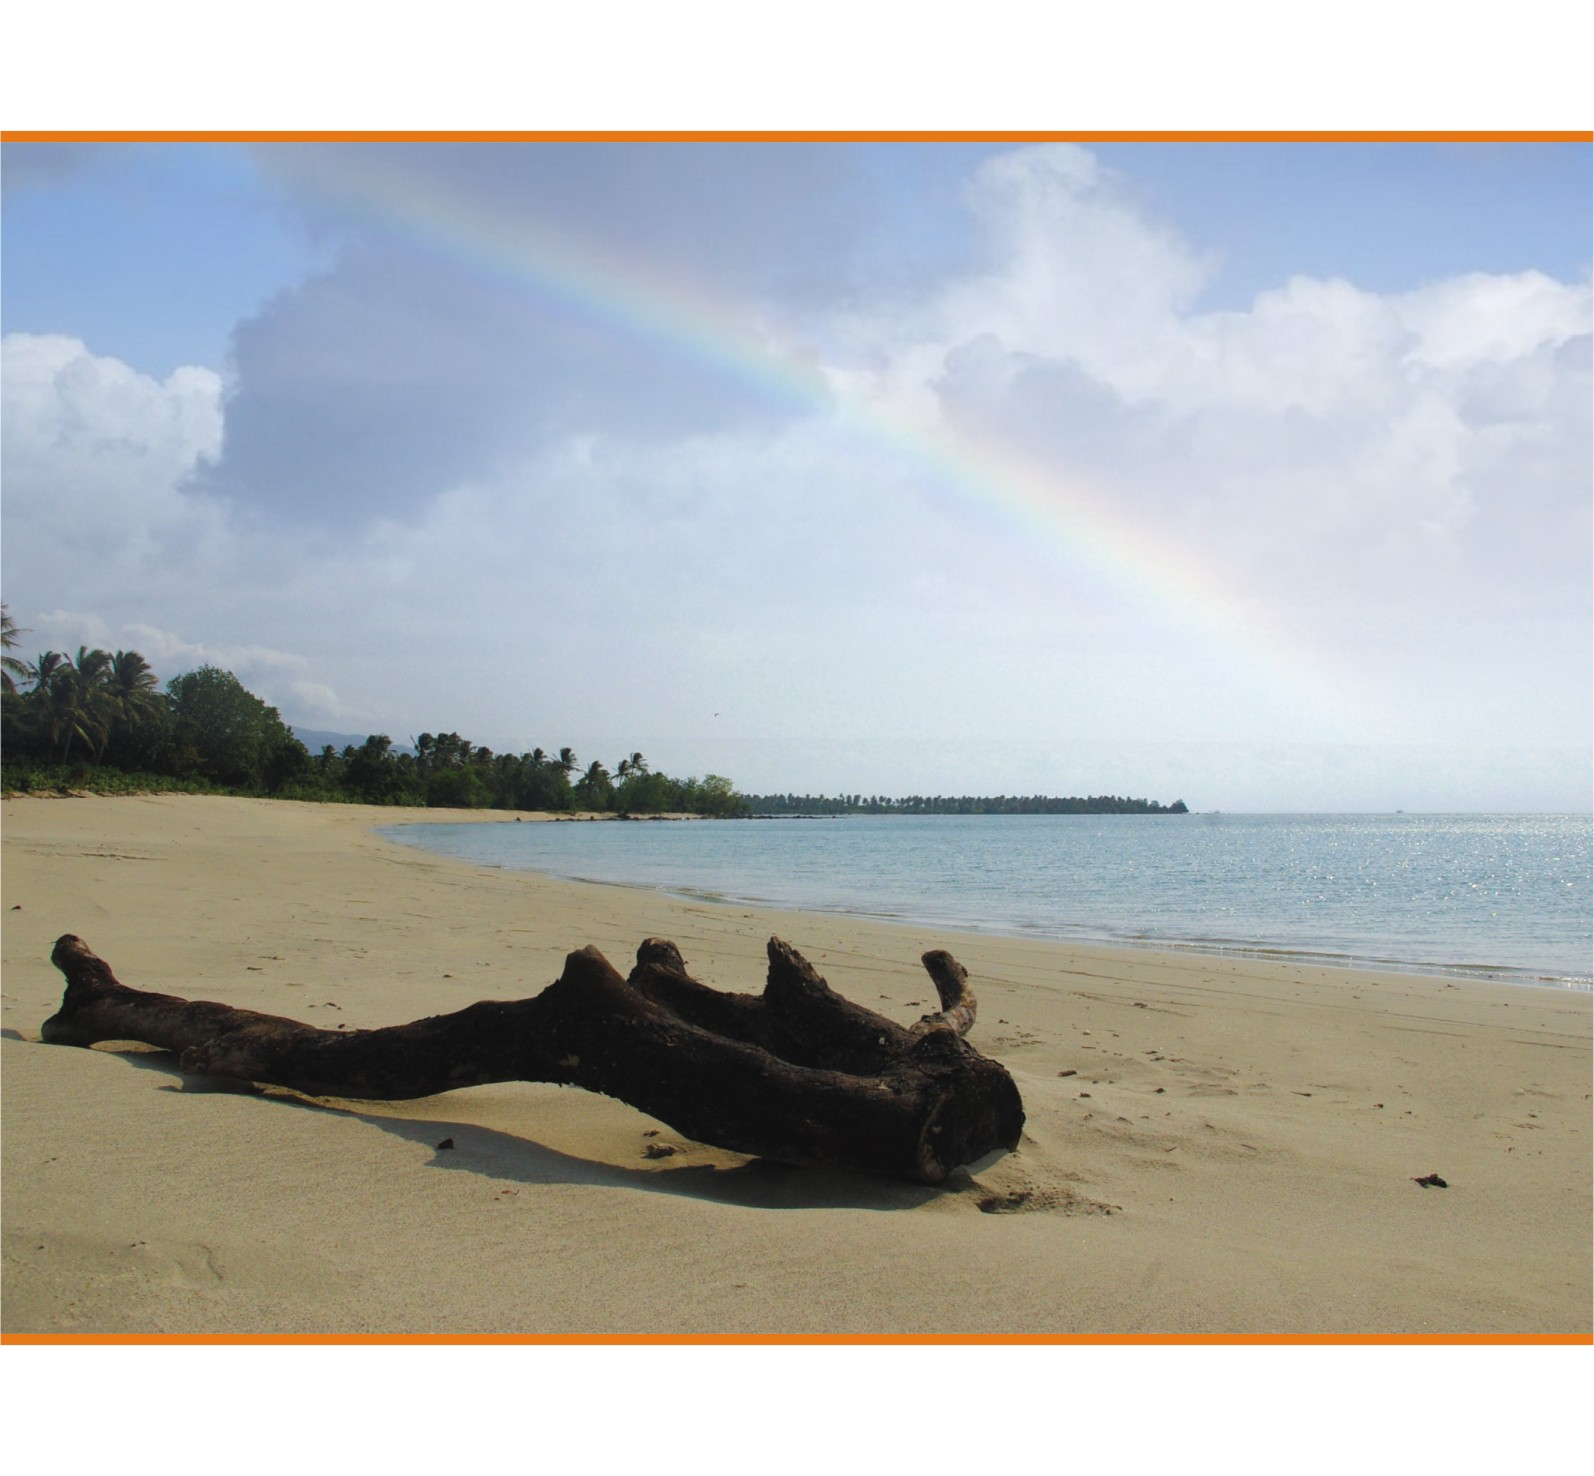 Pesona Wisata Pantai Pandeglang Kenali Daerah Cintai Negeri Ciputih Sumur